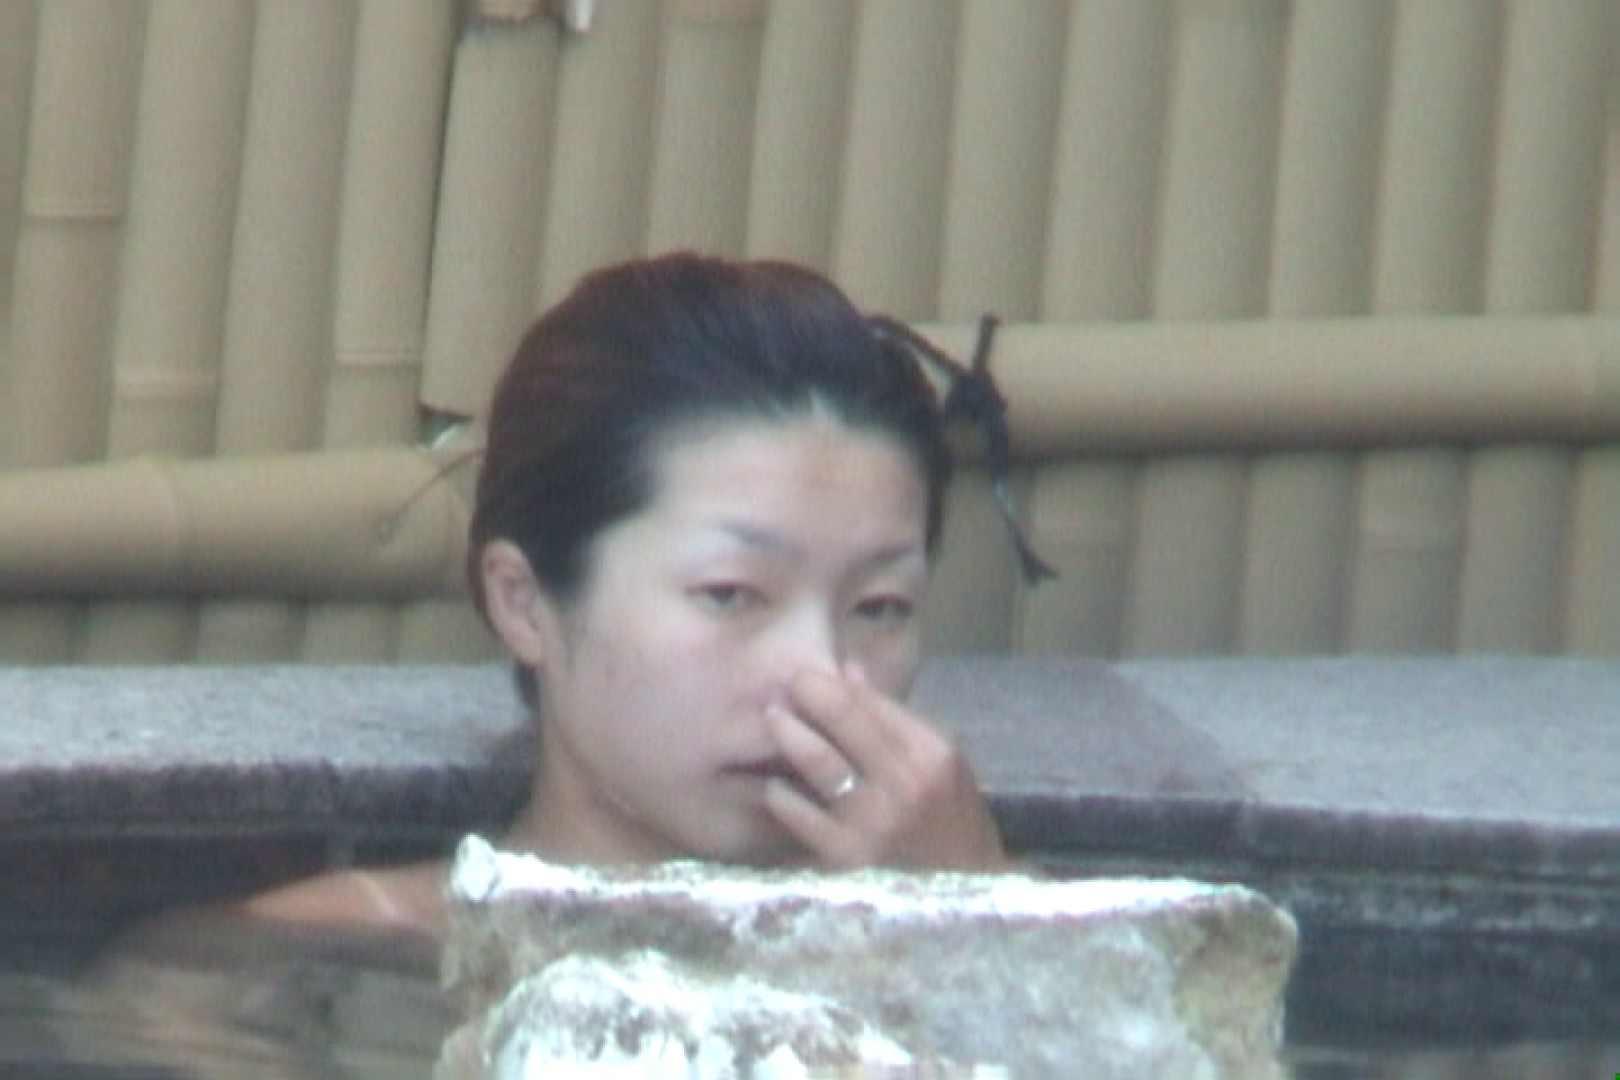 Aquaな露天風呂Vol.571 盗撮映像  35Pix 10